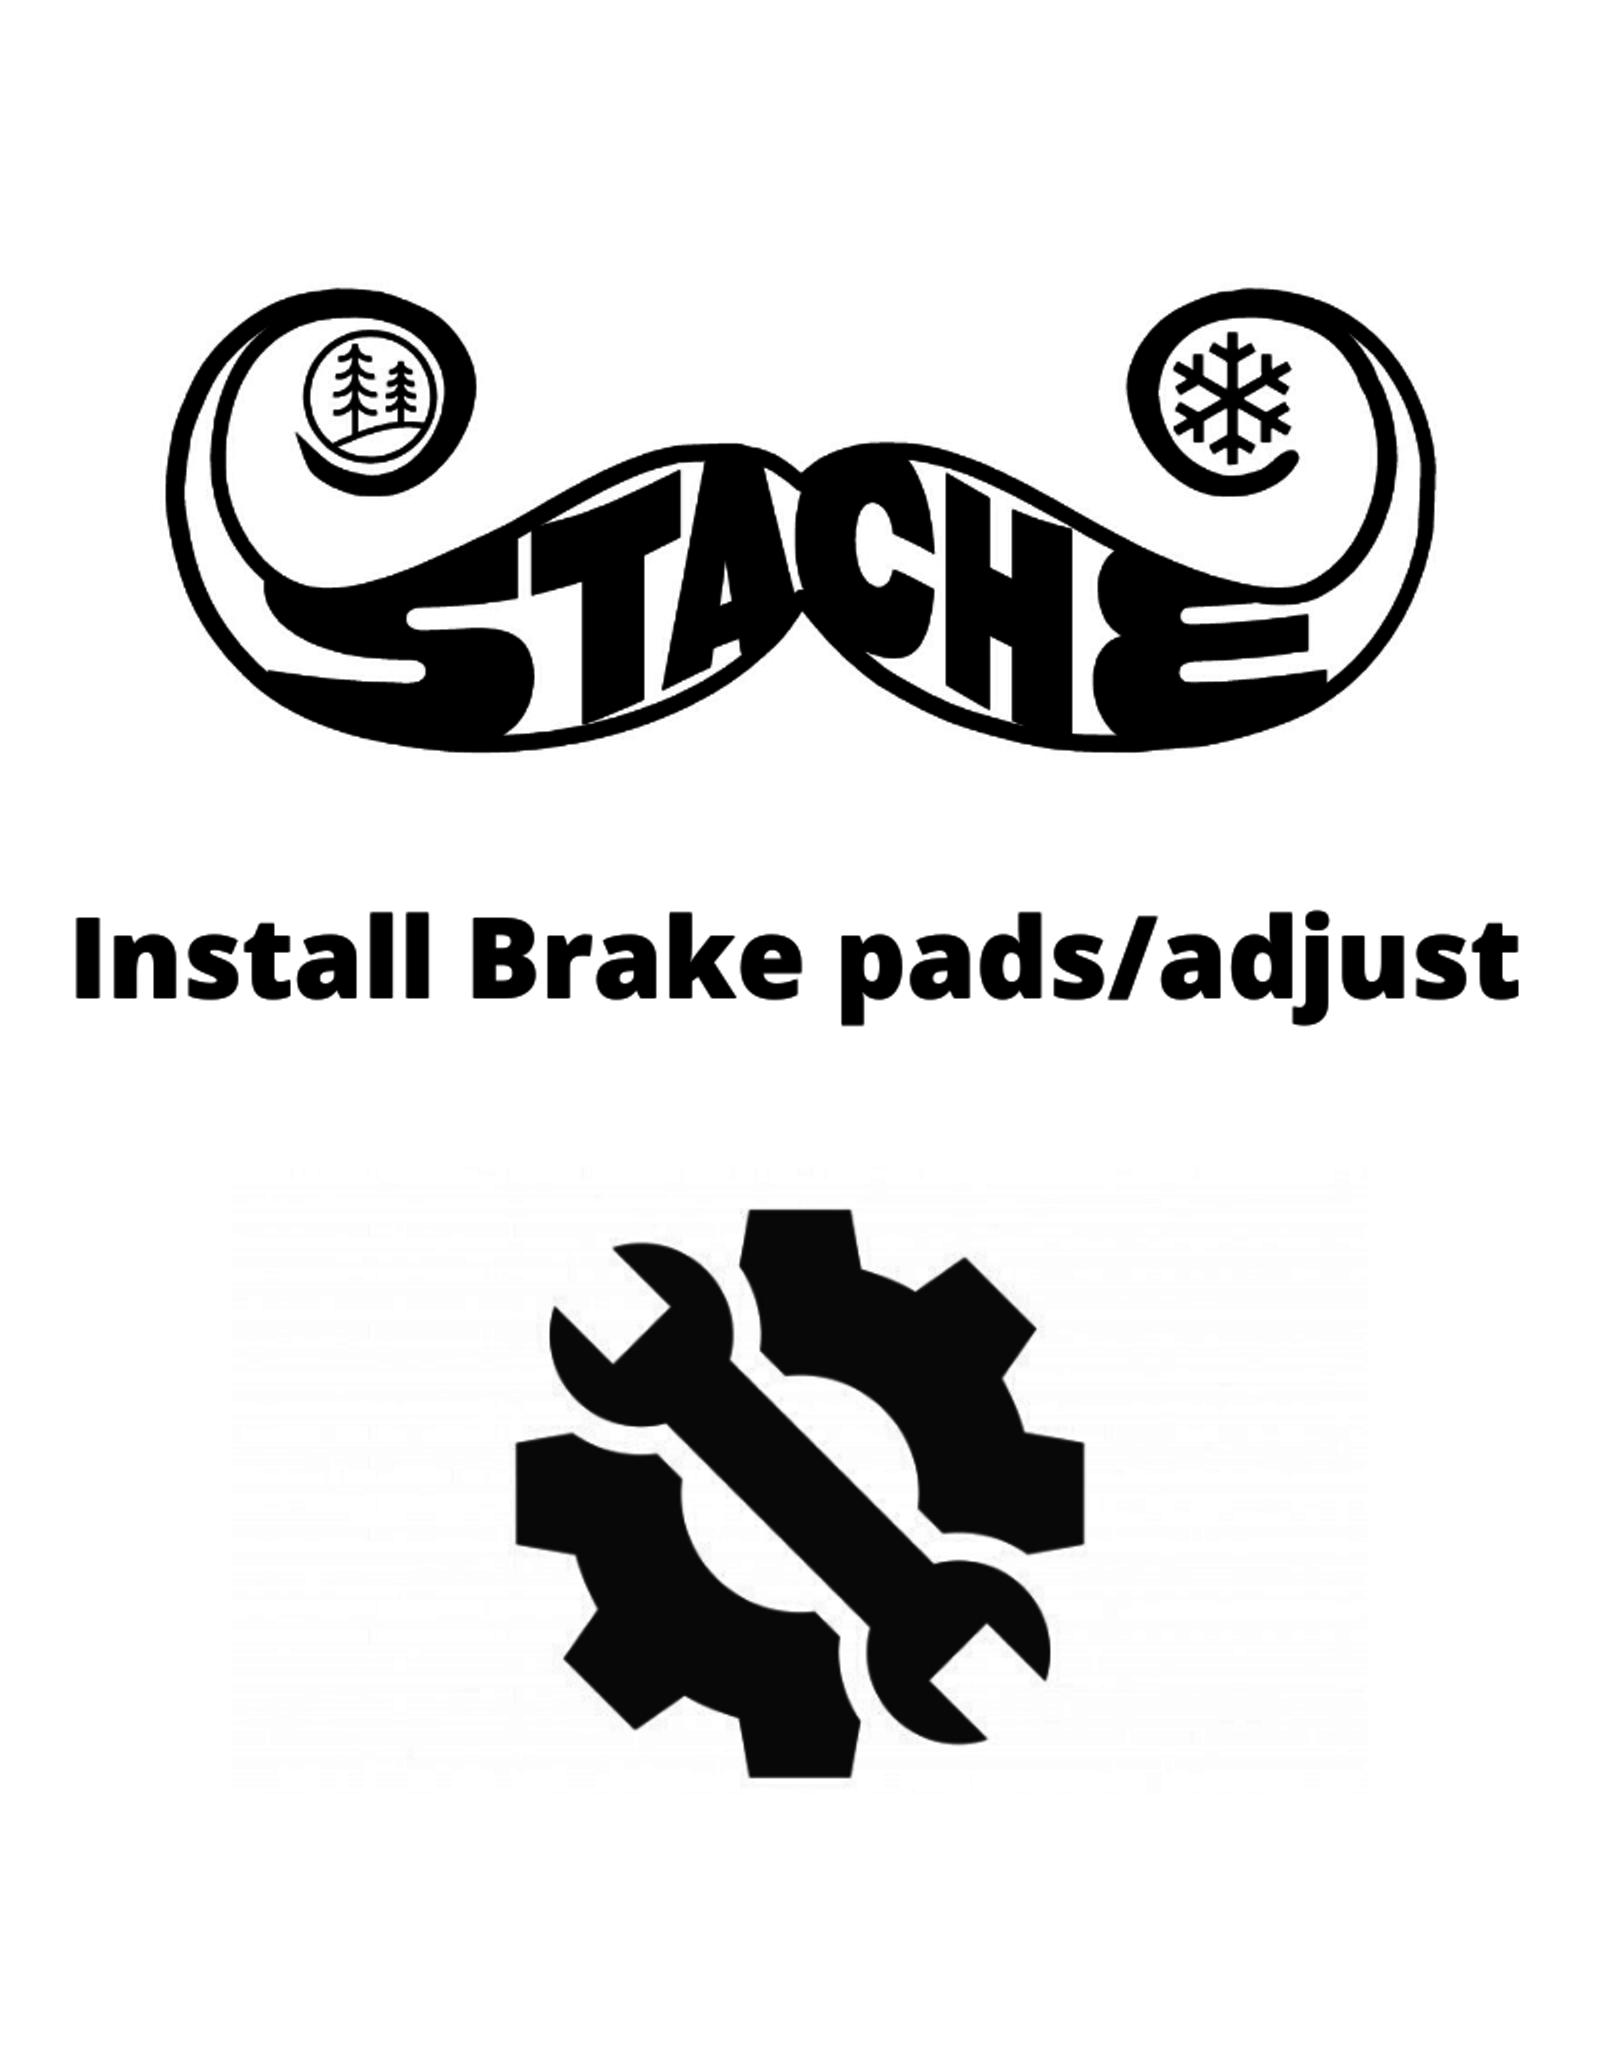 Install Brake pads/adjust